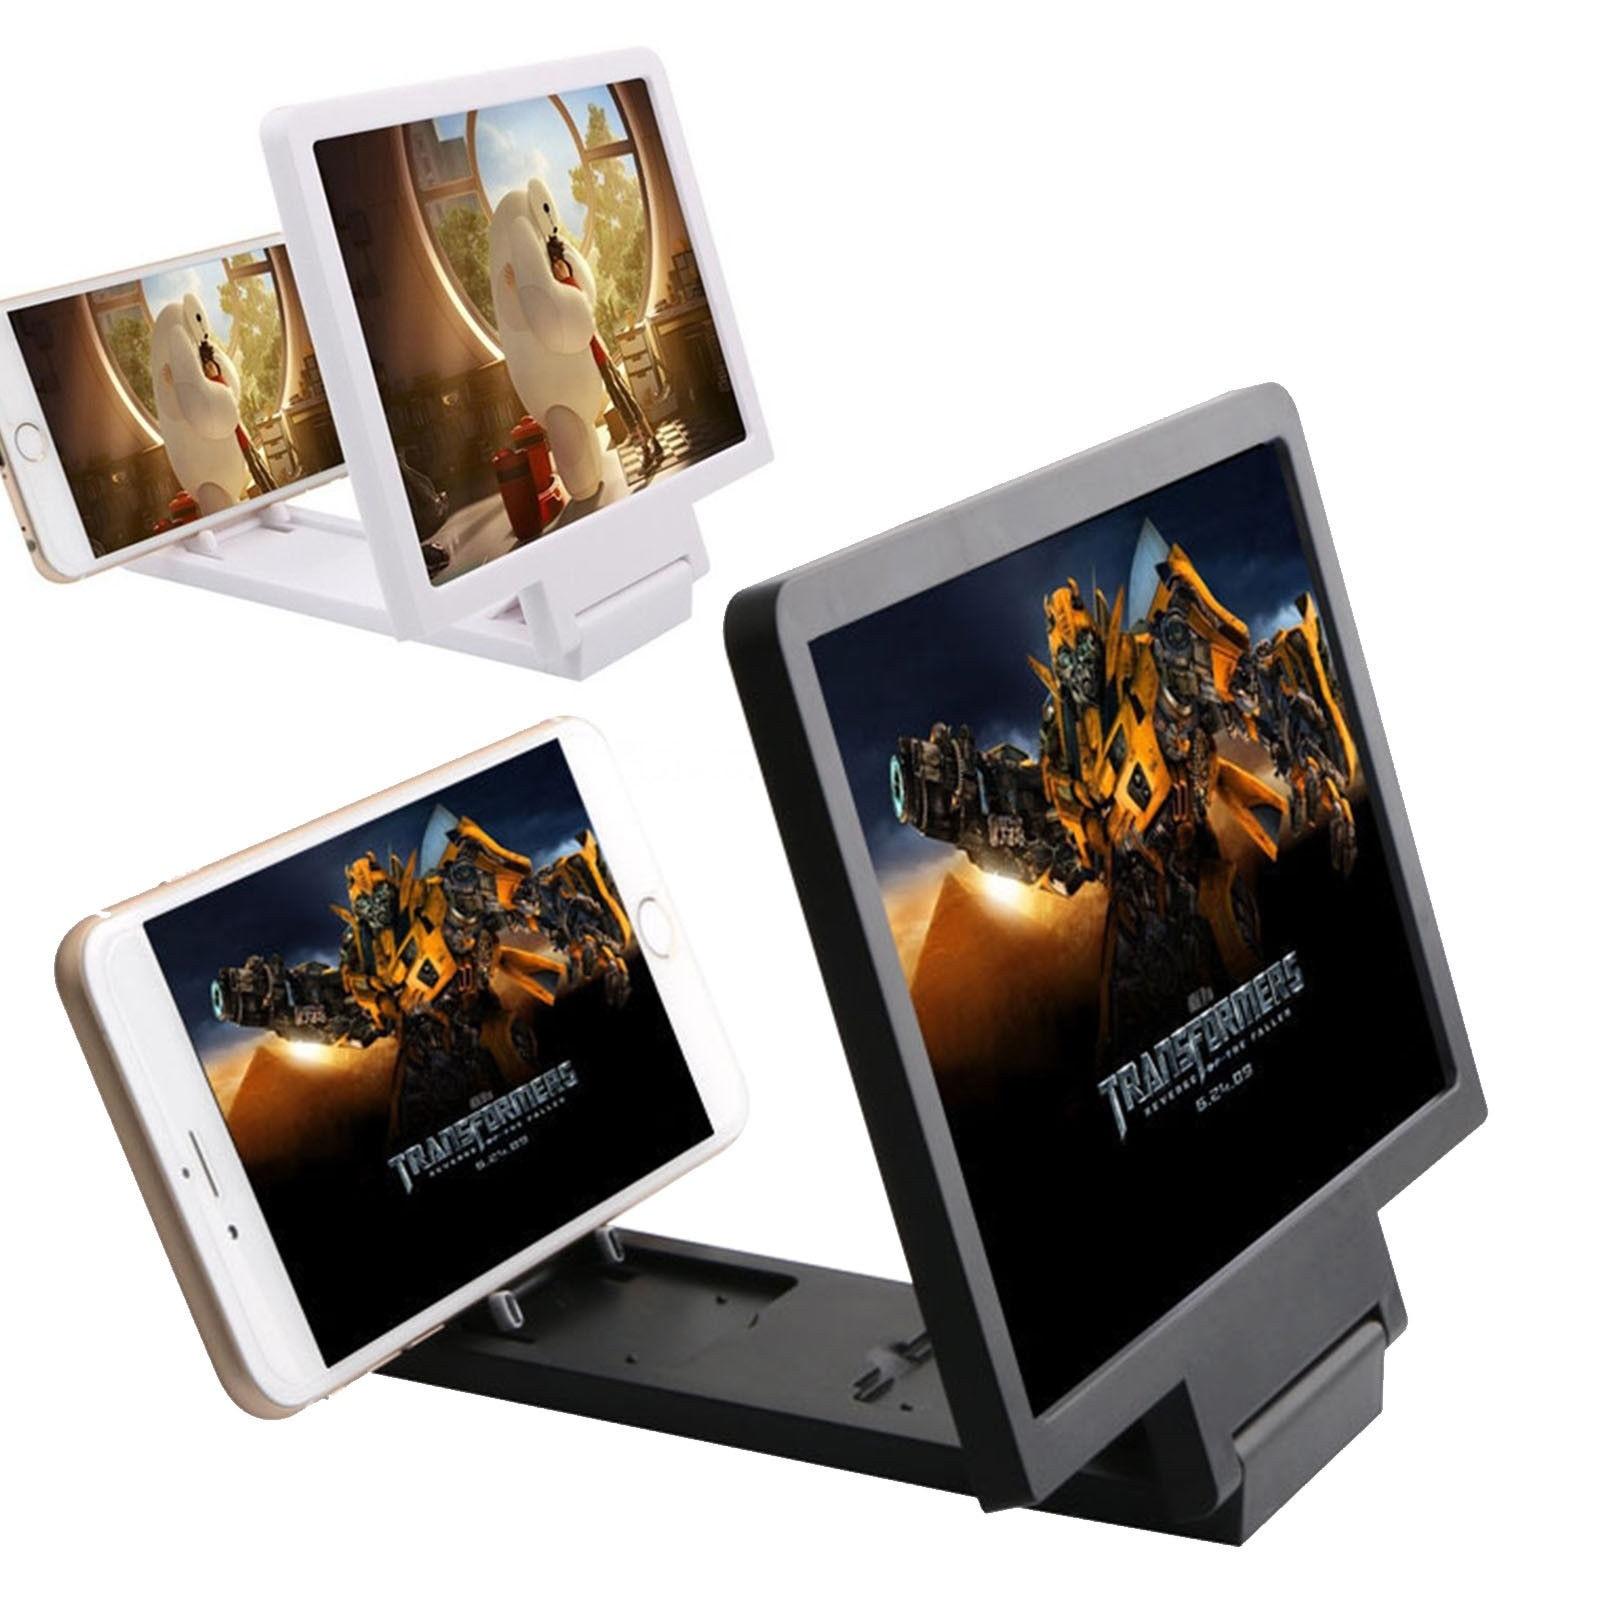 1pcs 14inch 3D Enlarged Screen Mobile Phone Amplifier Magnifier Bracket Cellphone Holder